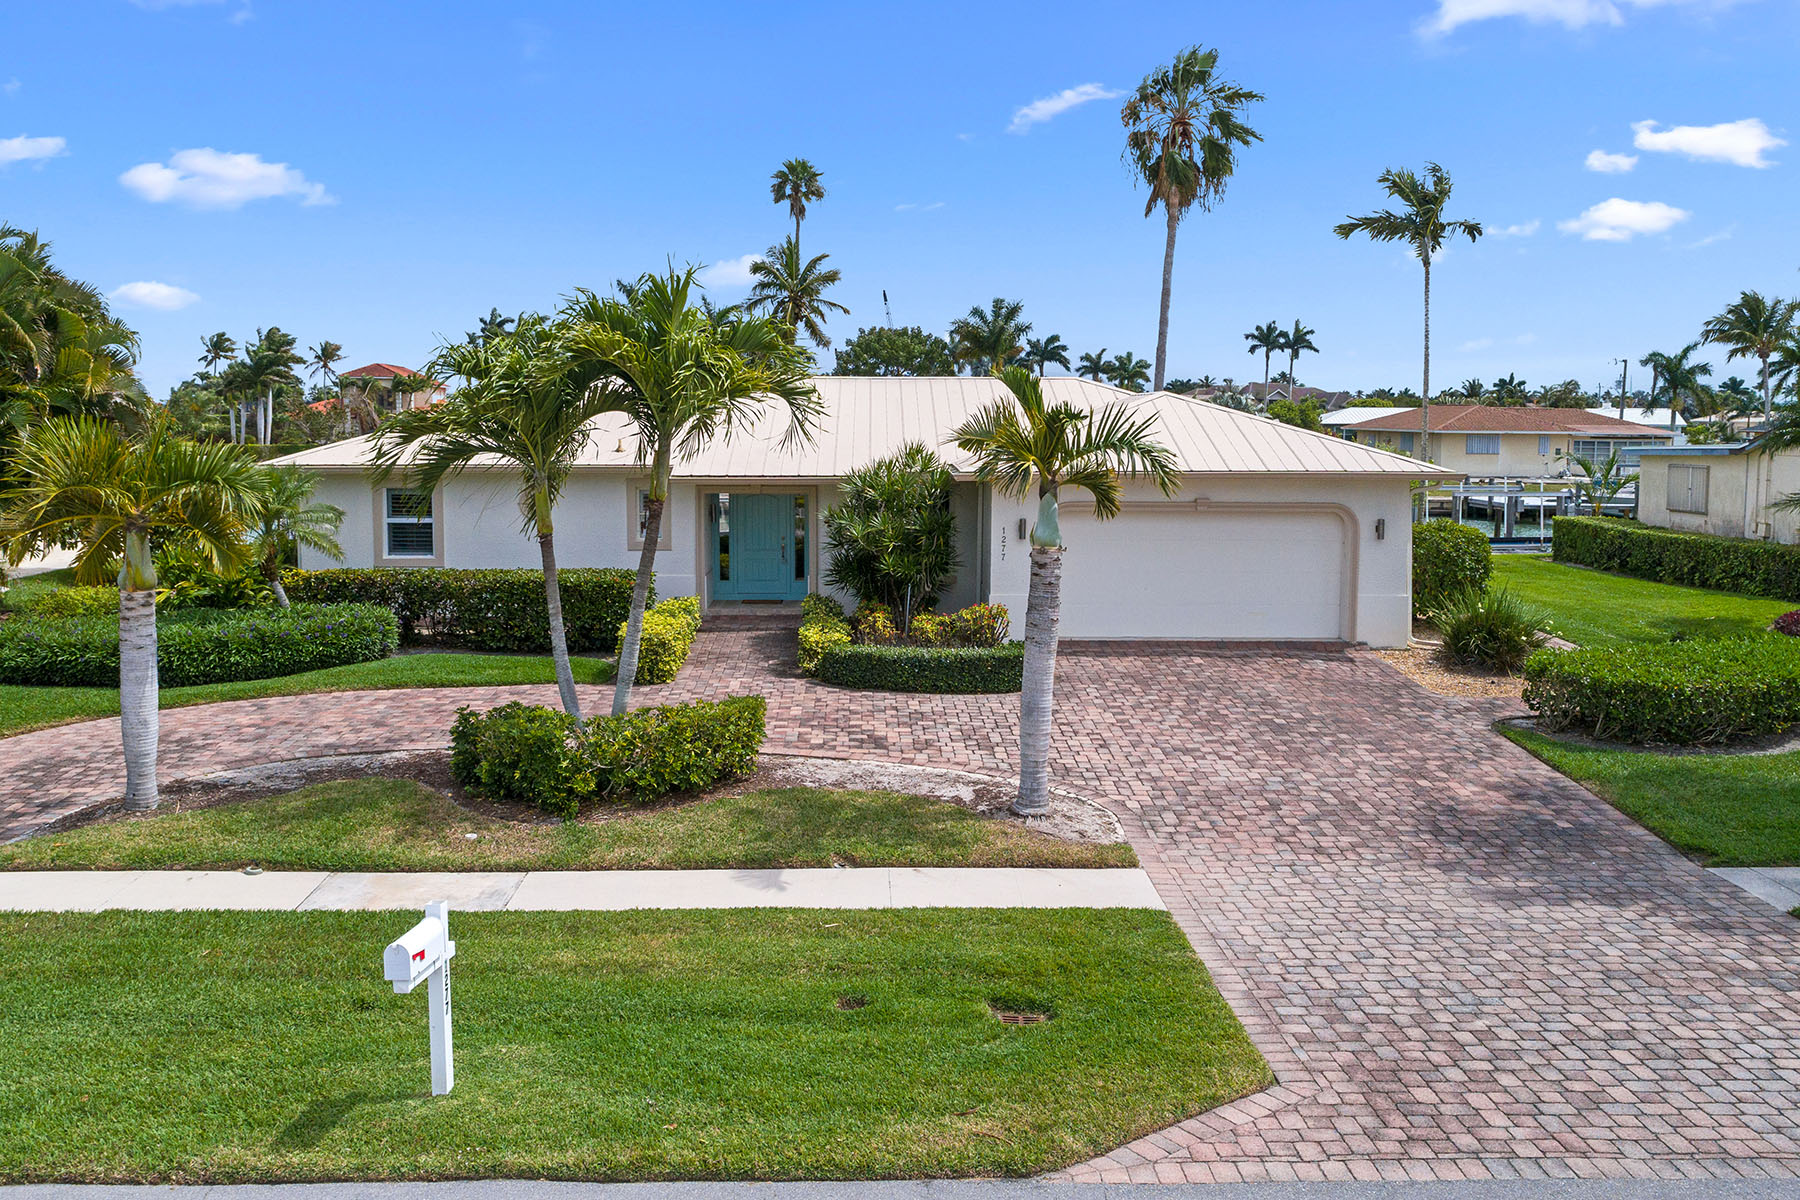 Property for Sale at MARCO ISLAND 1277 Orange Court, Marco Island, Florida 34145 United States